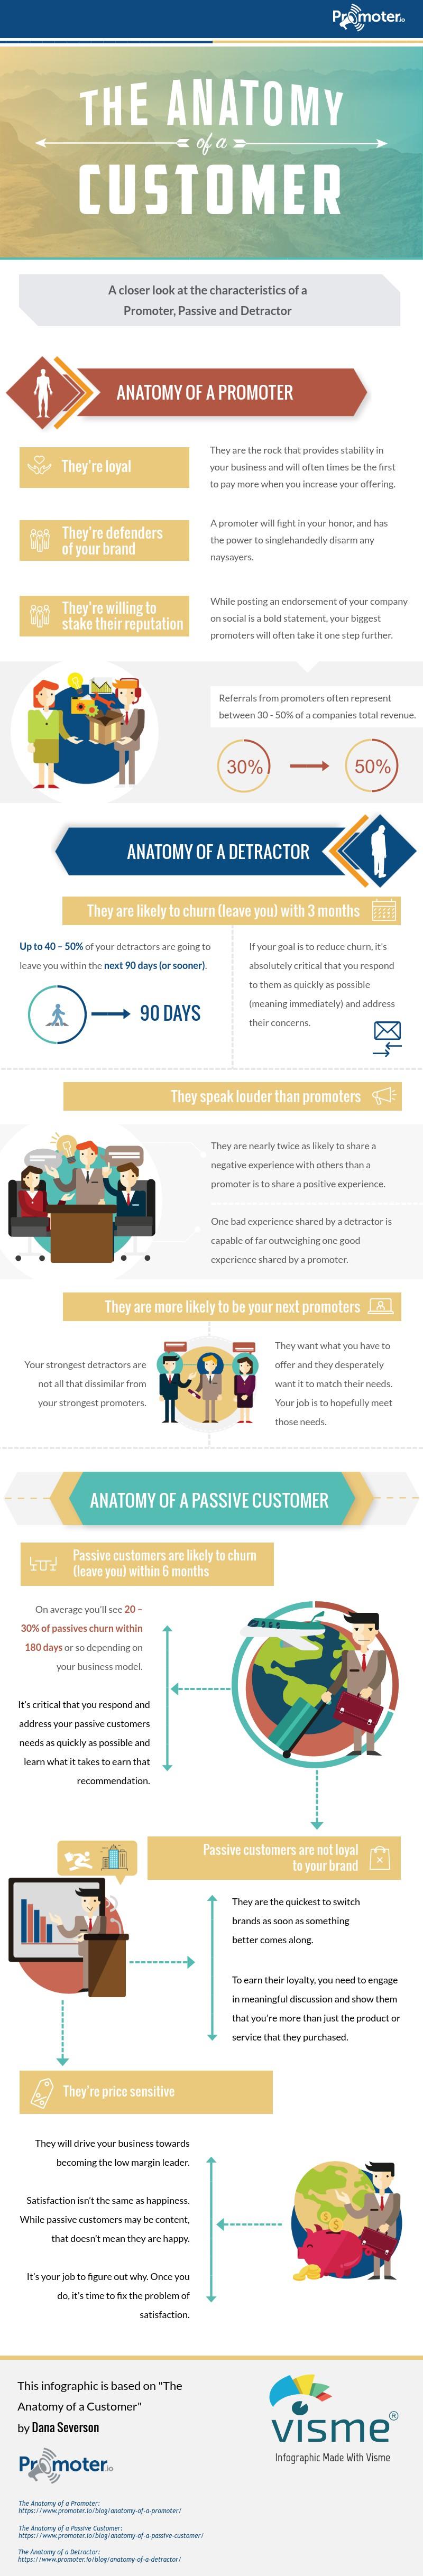 The Anatomy of a Customer